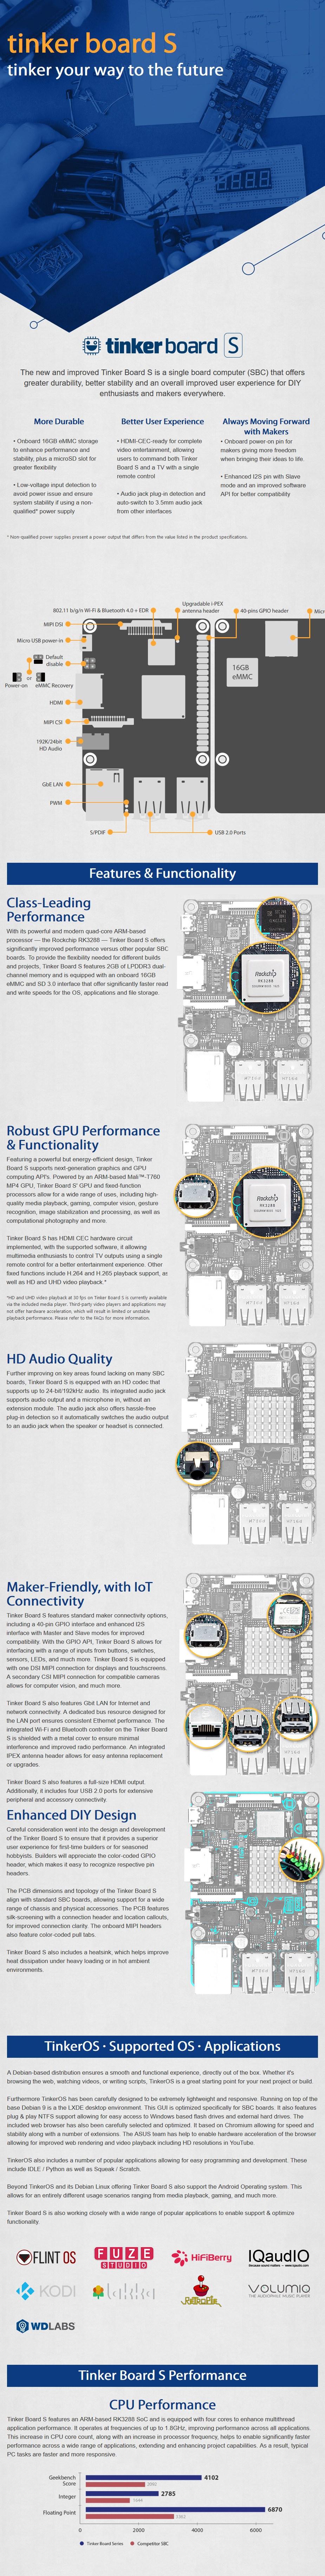 ASUS Tinker Board S ARM Rockchip RK3288 Microcontroller - Desktop Overview 1